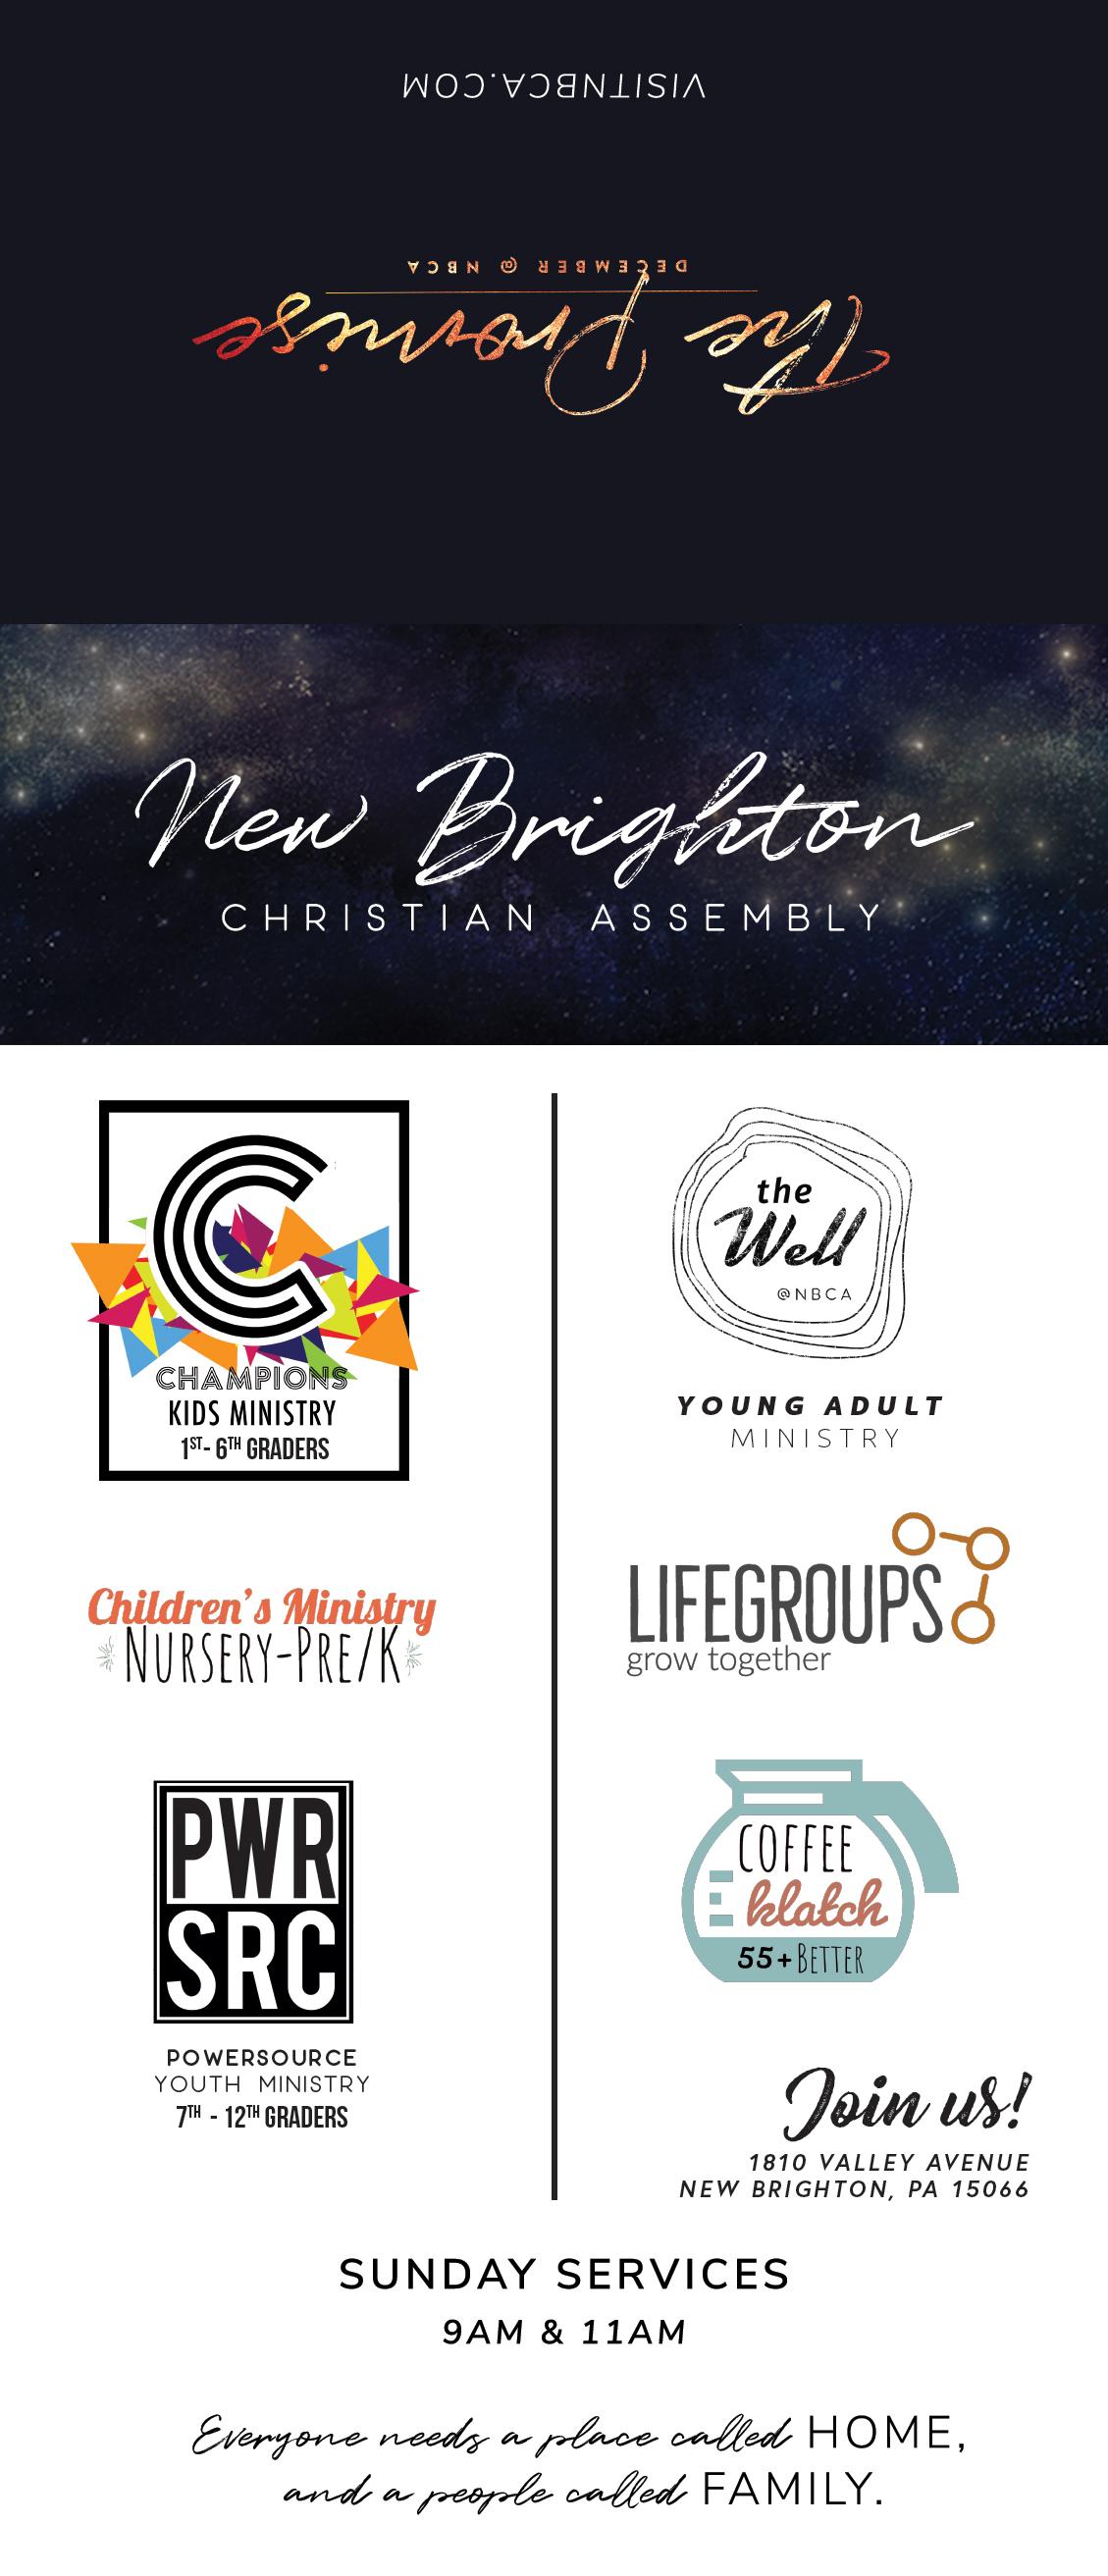 Series Theme Invite Card w/ Perforation